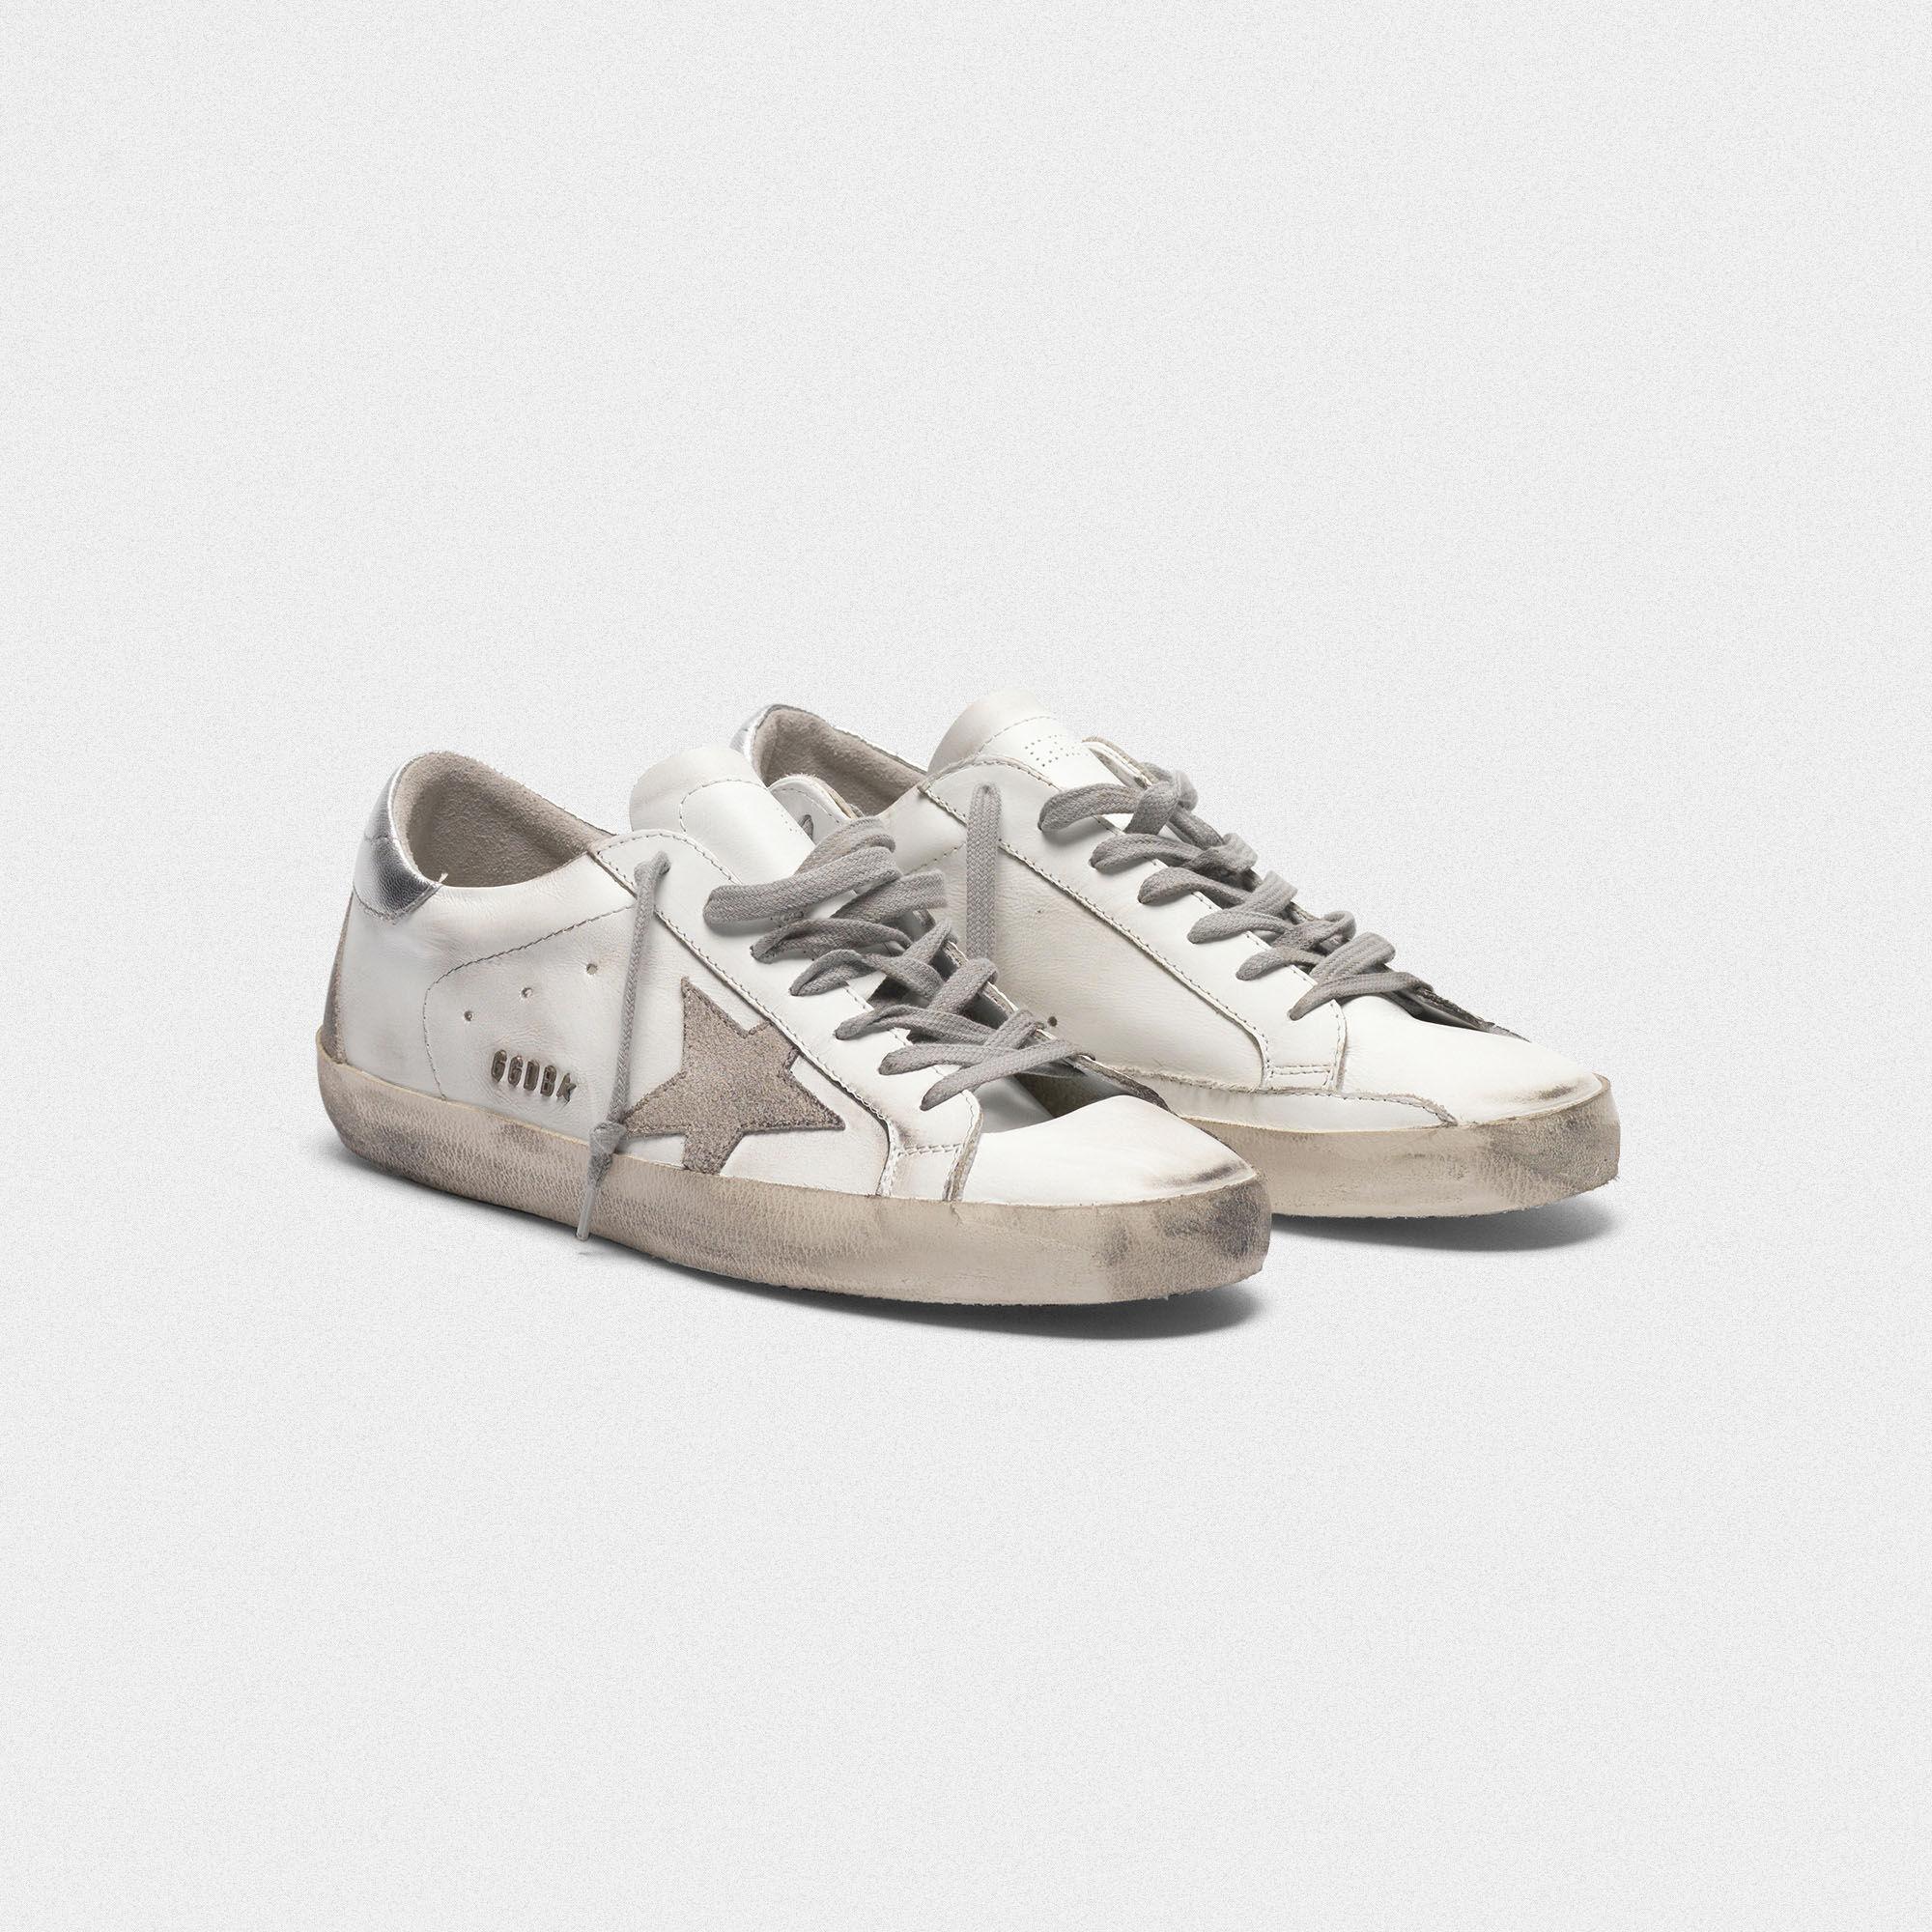 Superstar Superstar sneakers with